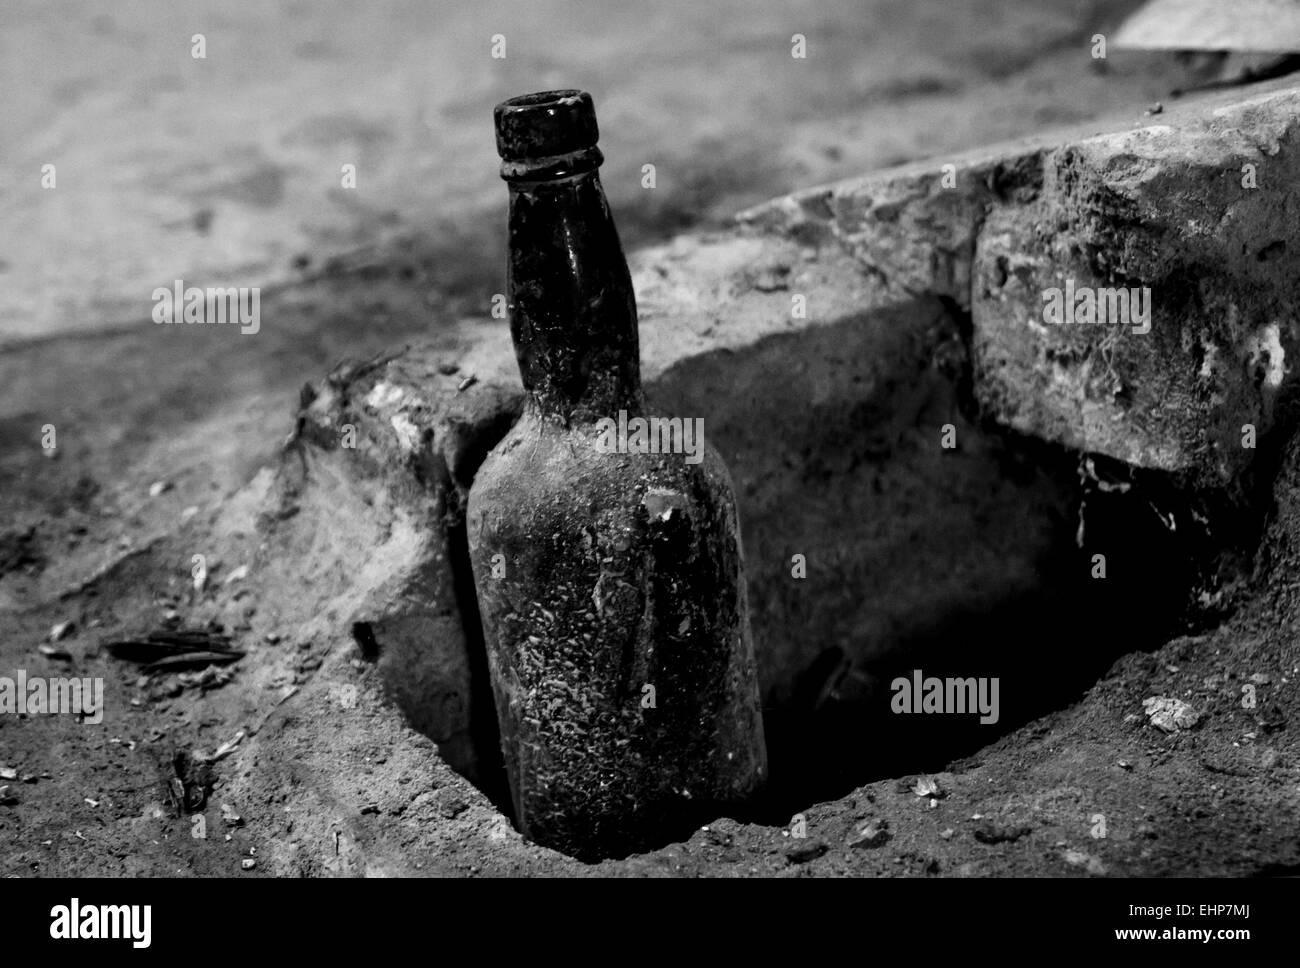 Vintage Bottle In A Hole